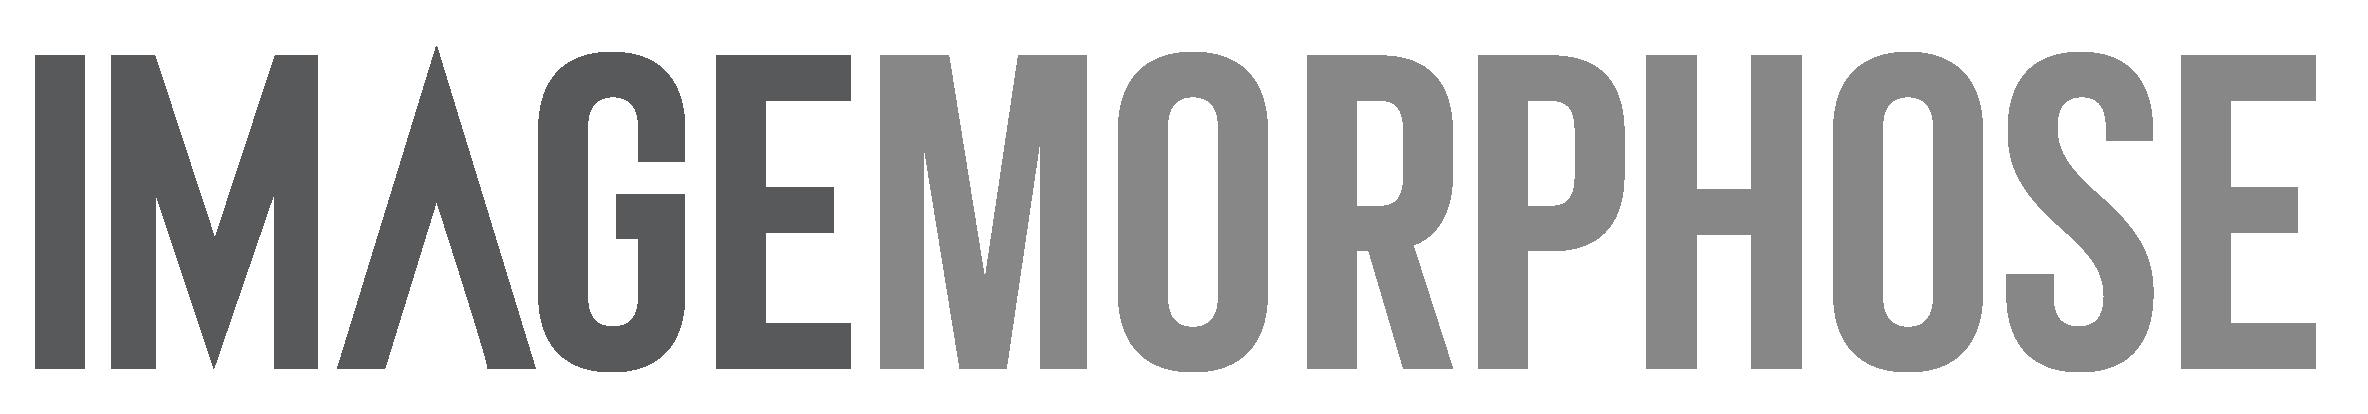 Imagemorphose